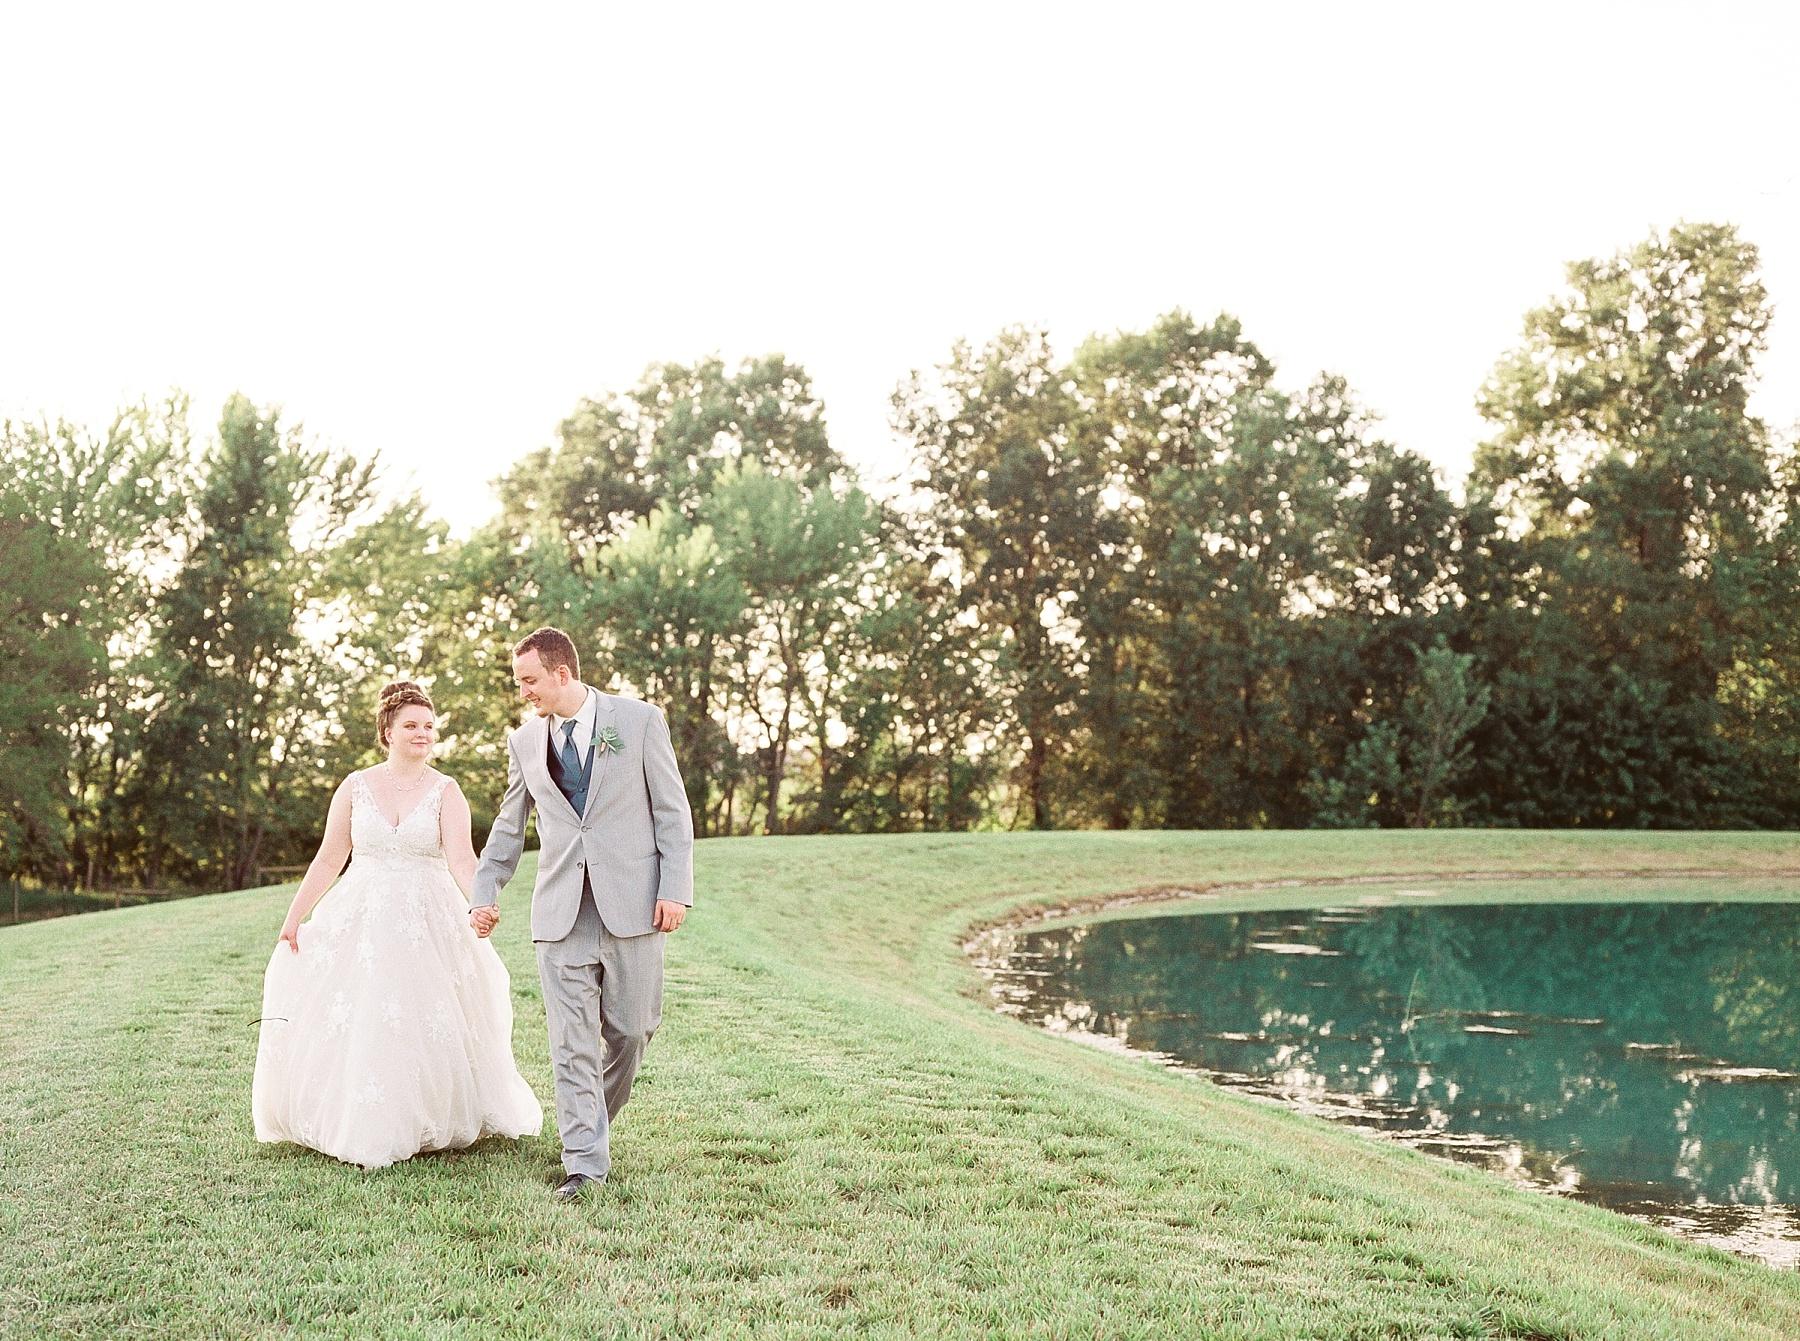 Intimate Summer Wedding at Emerson Fields by Kelsi Kliethermes Photography Best Missouri and Maui Wedding Photographer_0013.jpg